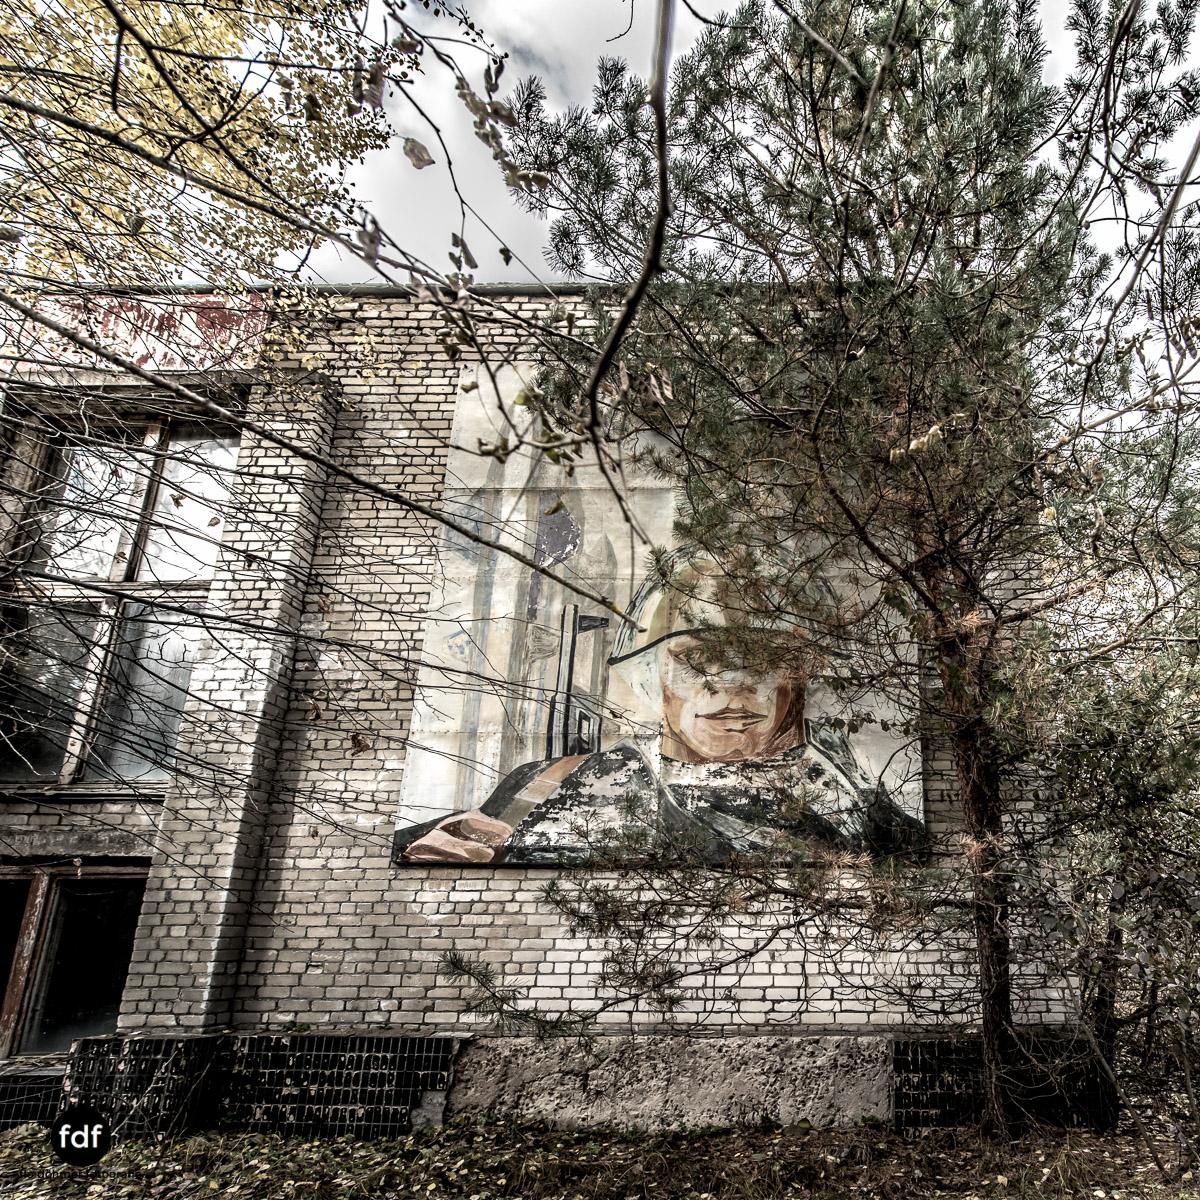 Tschernobyl-Chernobyl-Prypjat-Urbex-Lost-Place-Duga-Schule-Kino-24.jpg